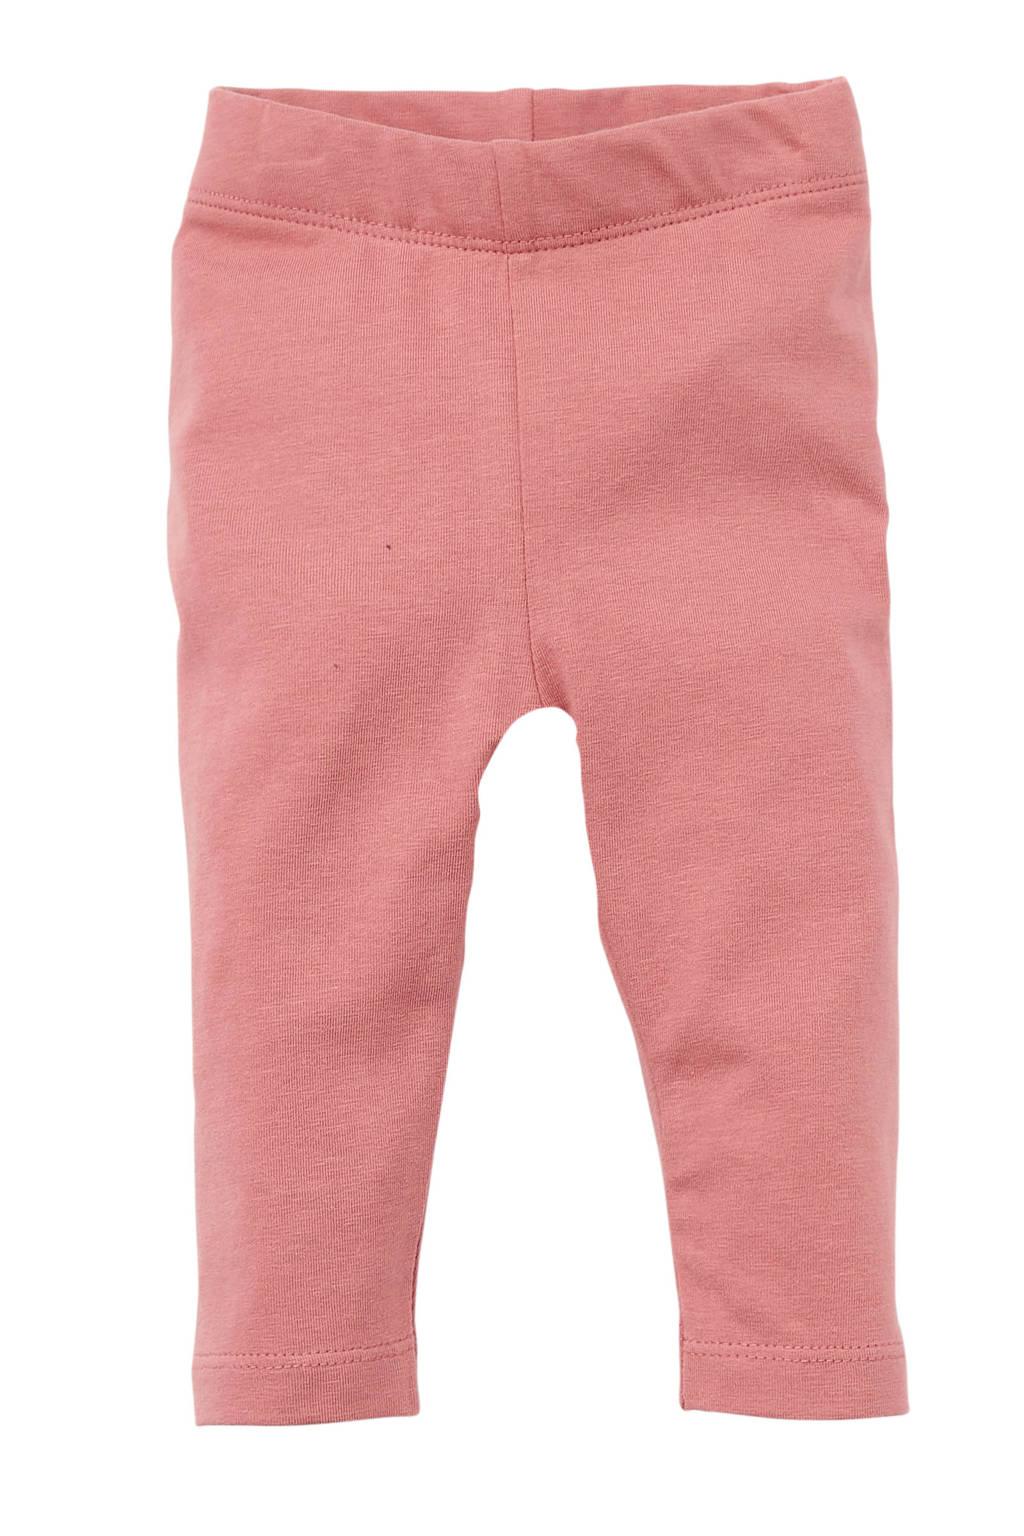 LEVV baby regular fit broek oudroze, Oudroze